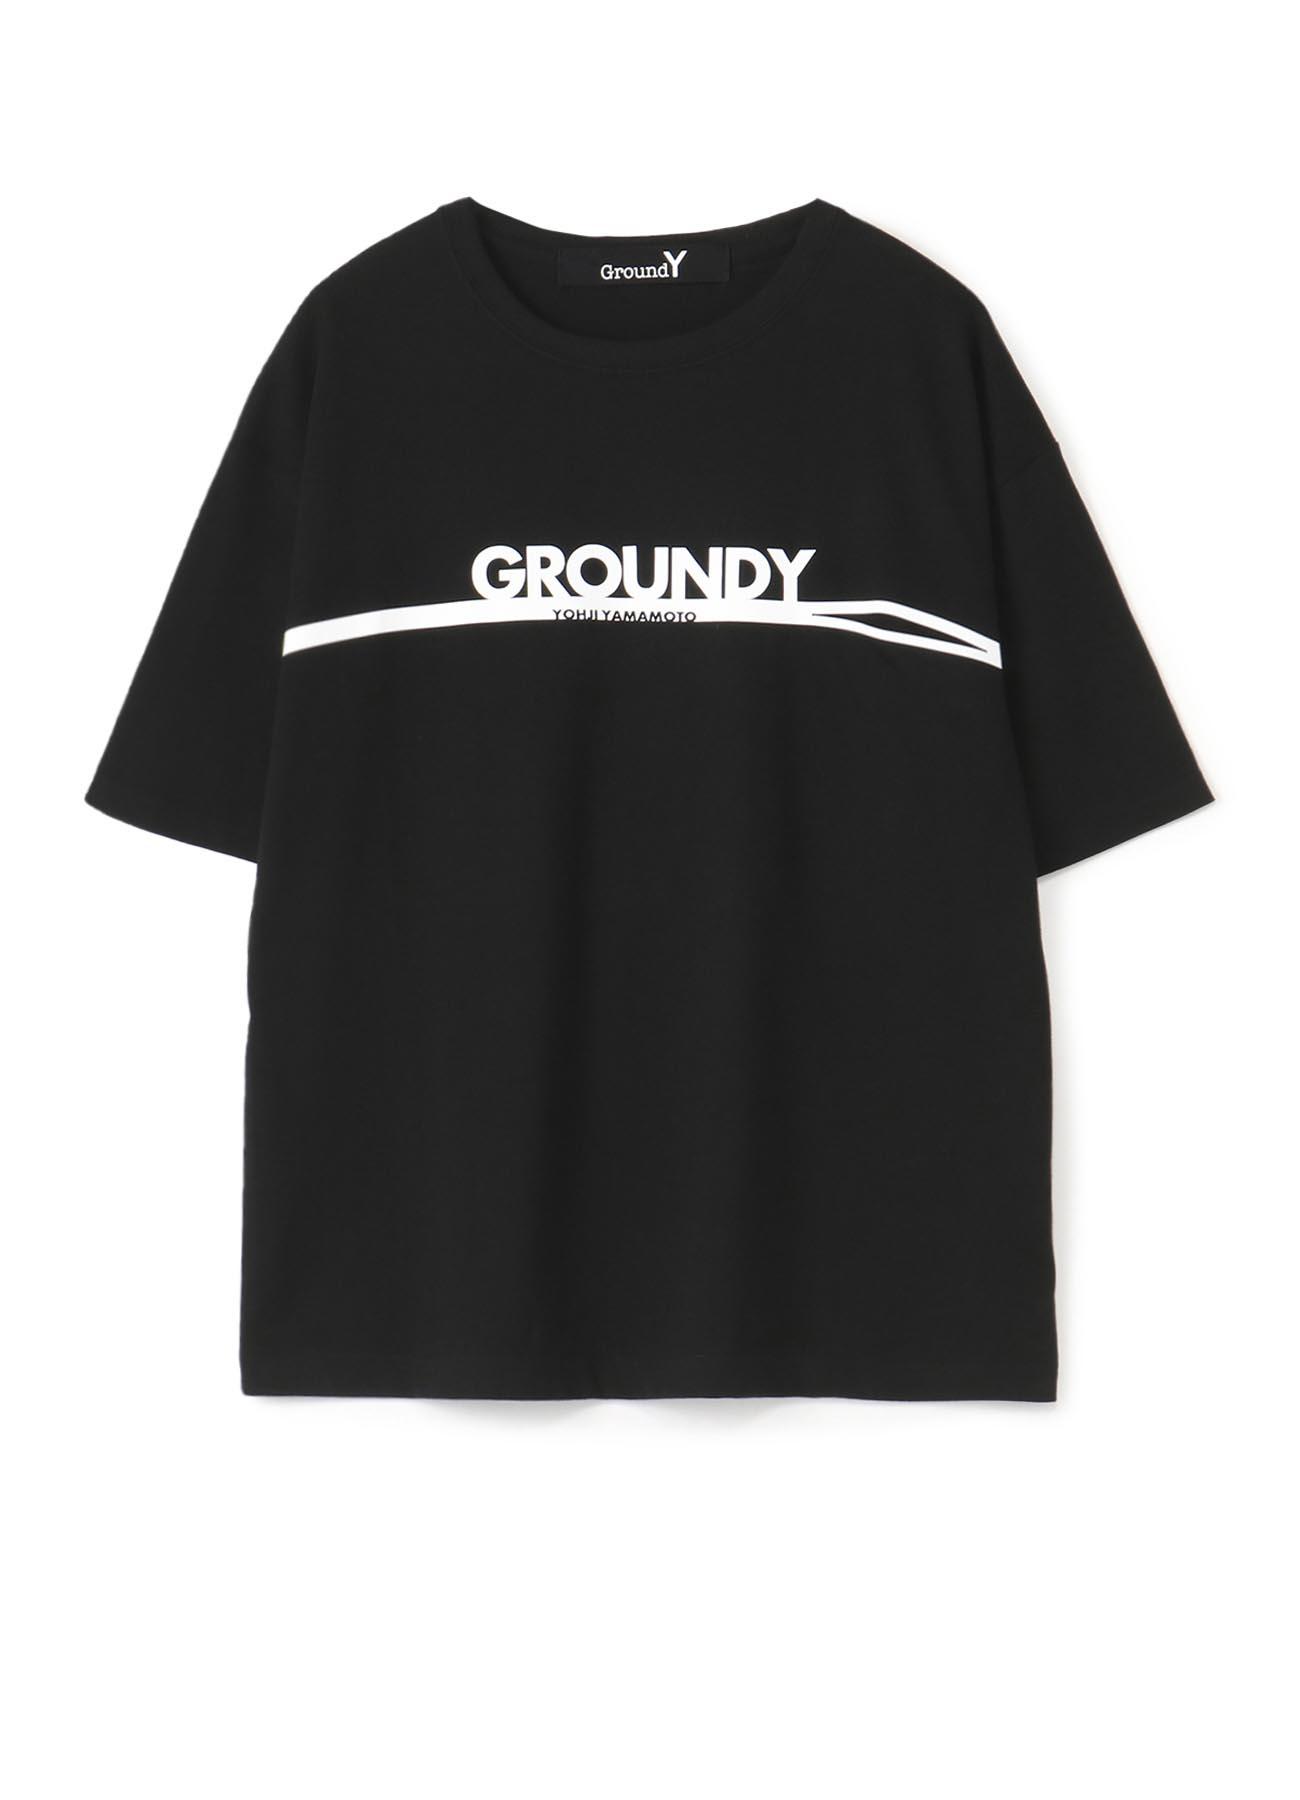 Ground Y & YOHJI YAMAMAOTO LOGO T恤